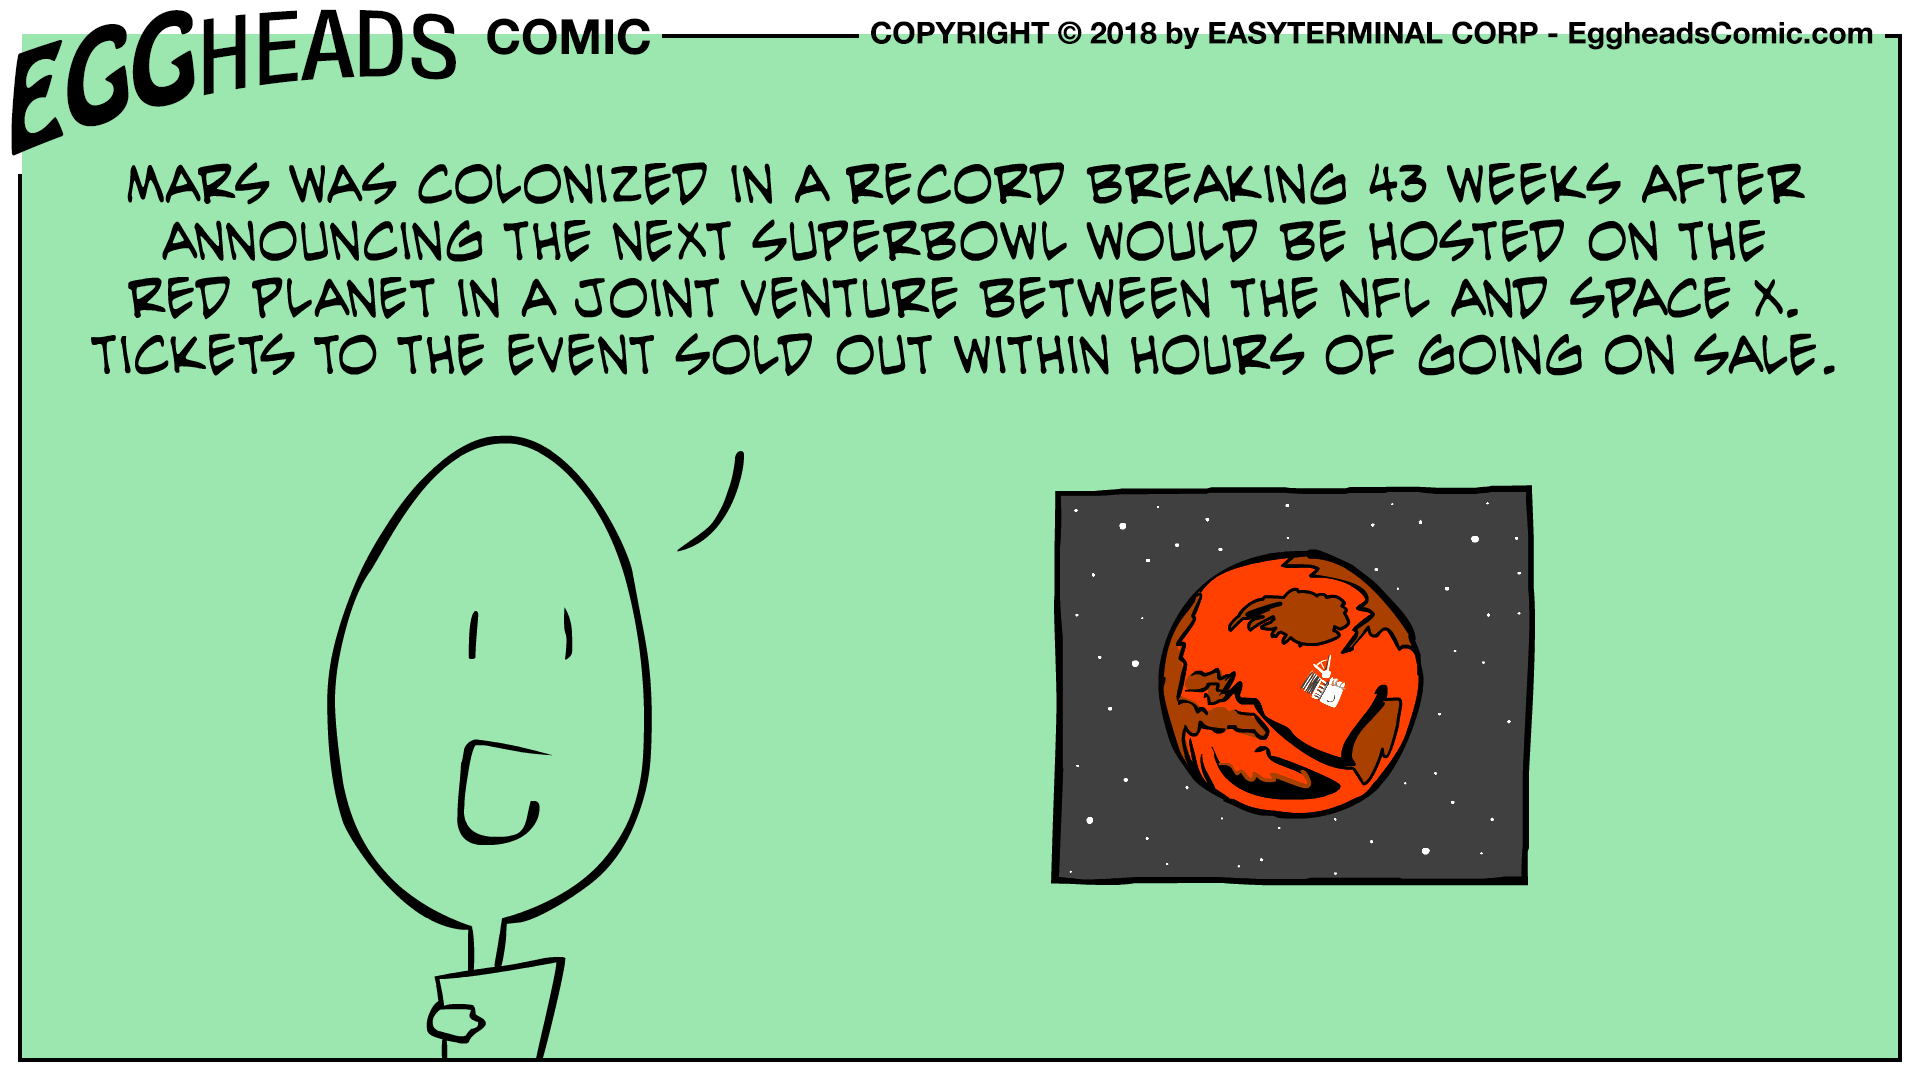 Webcomic Eggheads Comic Strip 053 Mars Was Colonized